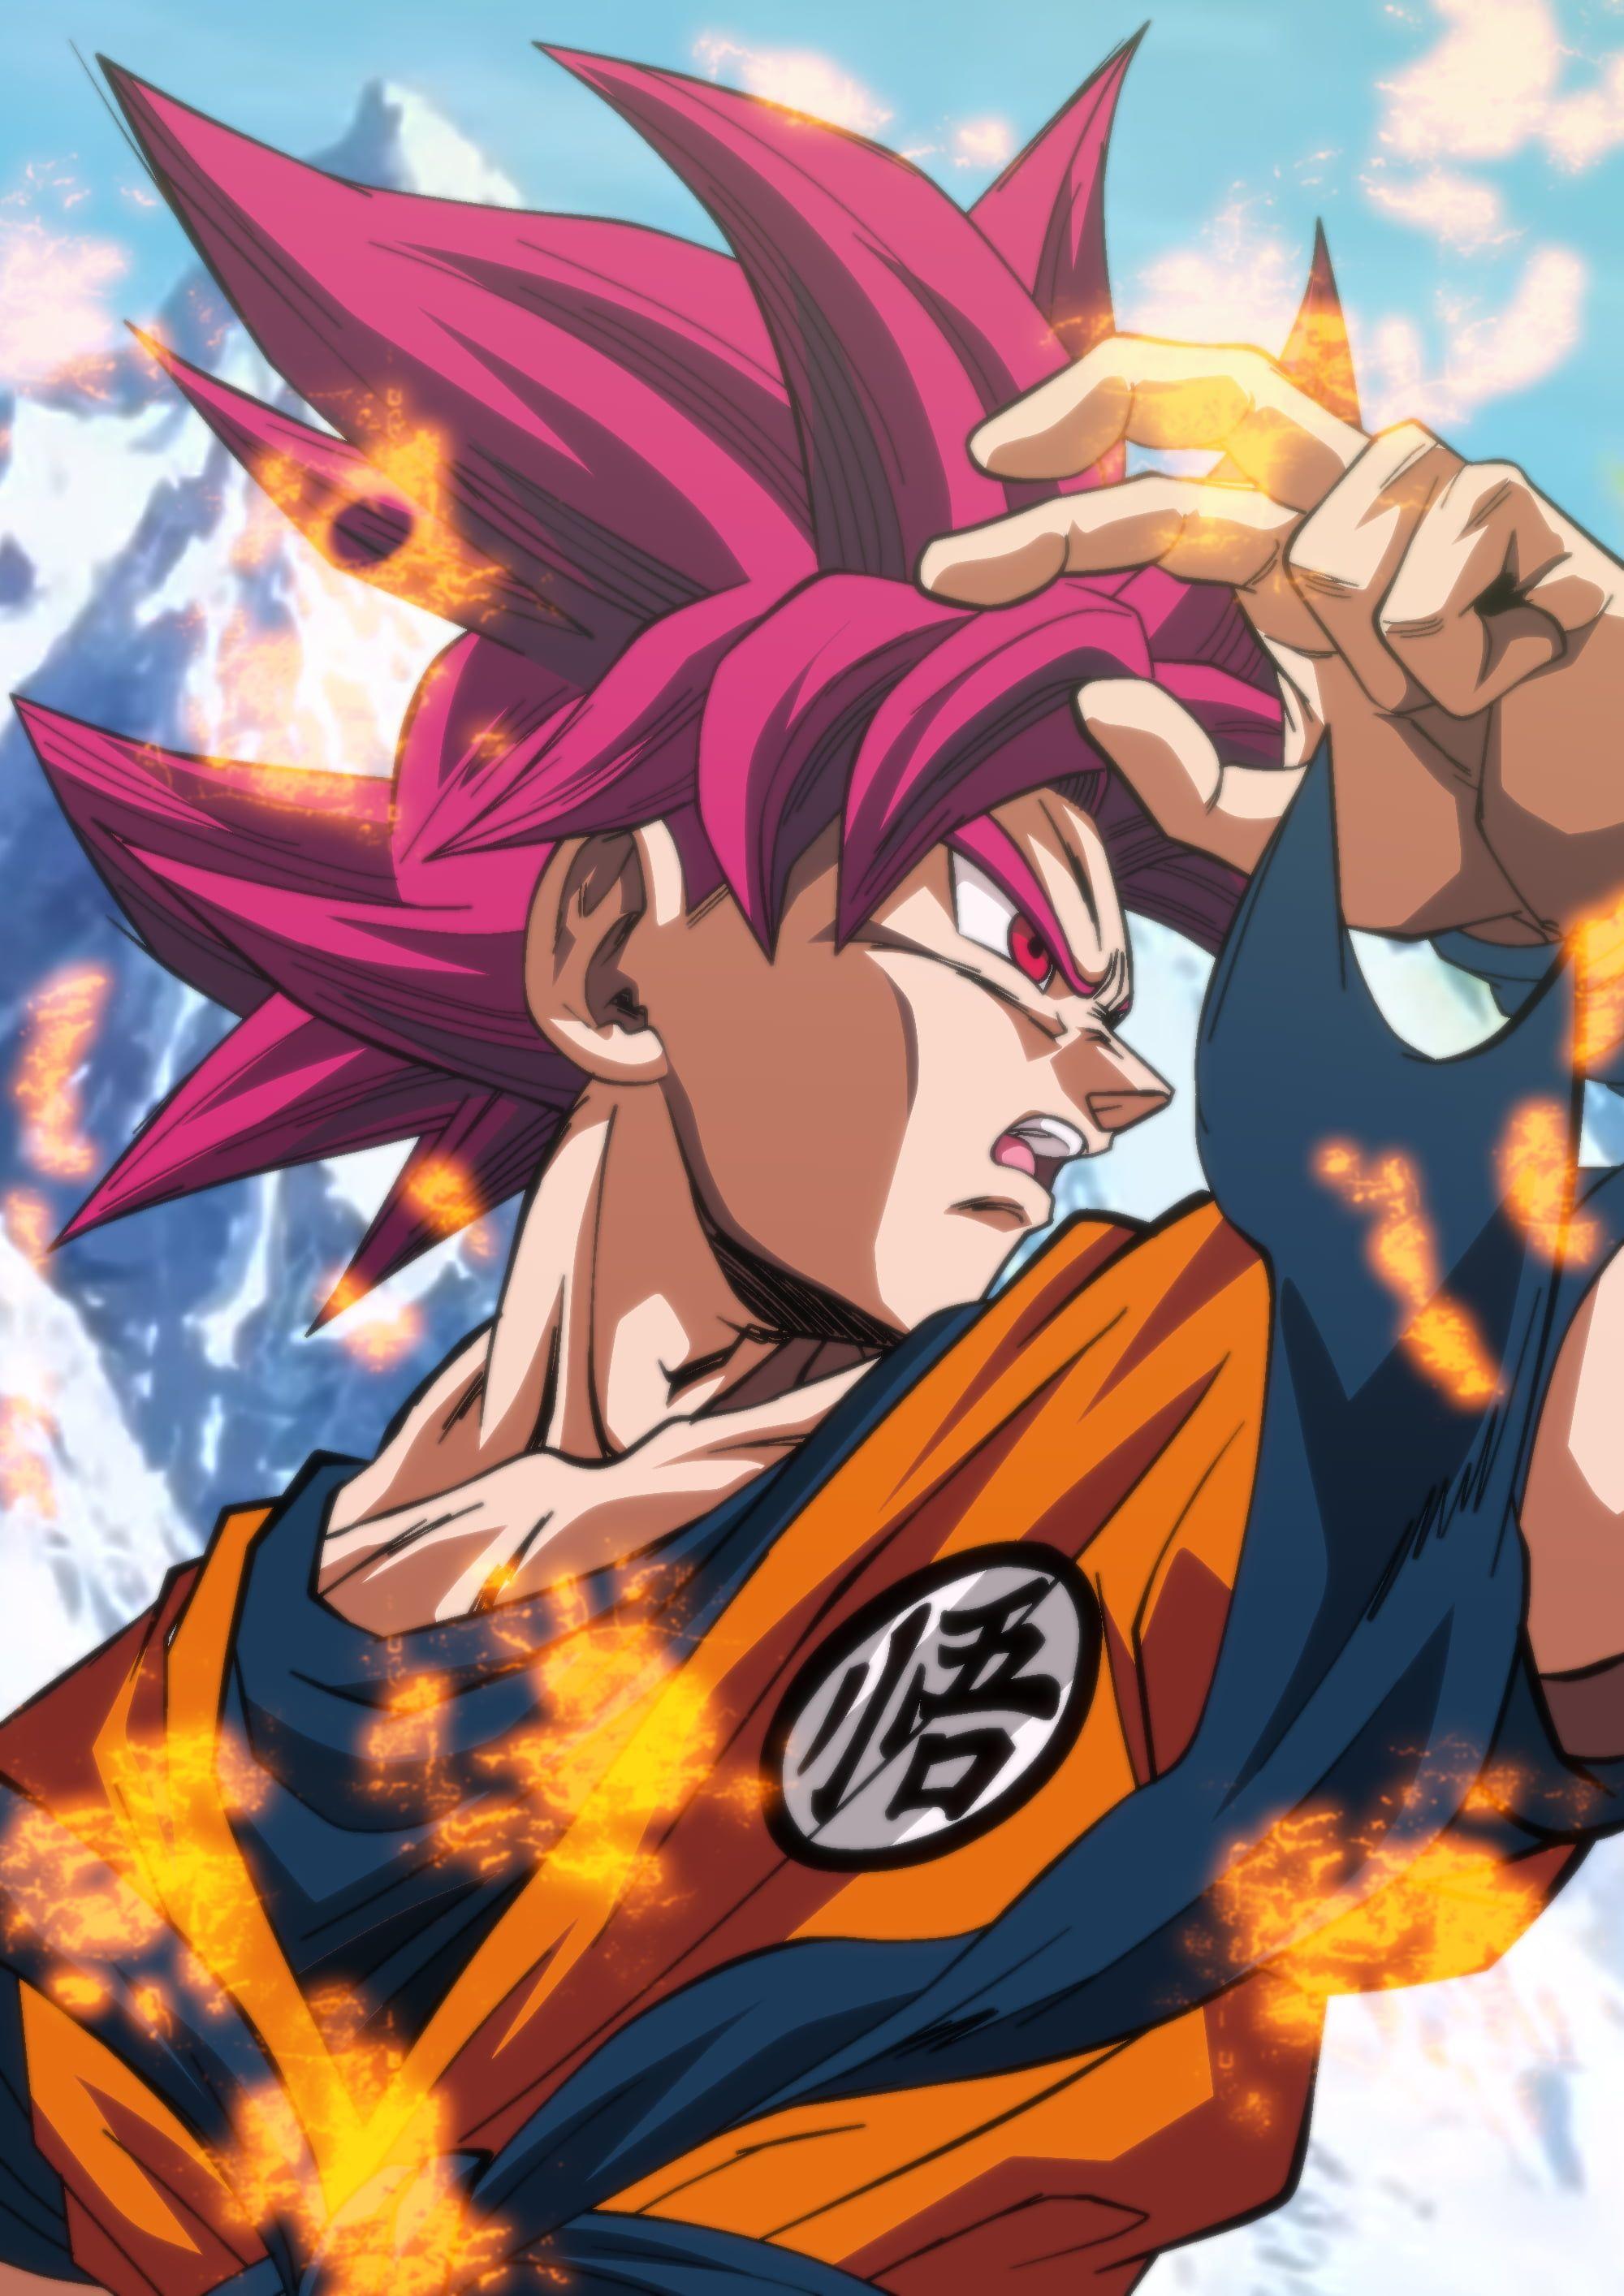 Son Goku Dragon Ball Super Anime Boys Anime Dragon Ball Red Eyes Redhead Super Saiyajin God Fan A Anime Dragon Ball Super Dragon Ball Super Manga Dragon Ball